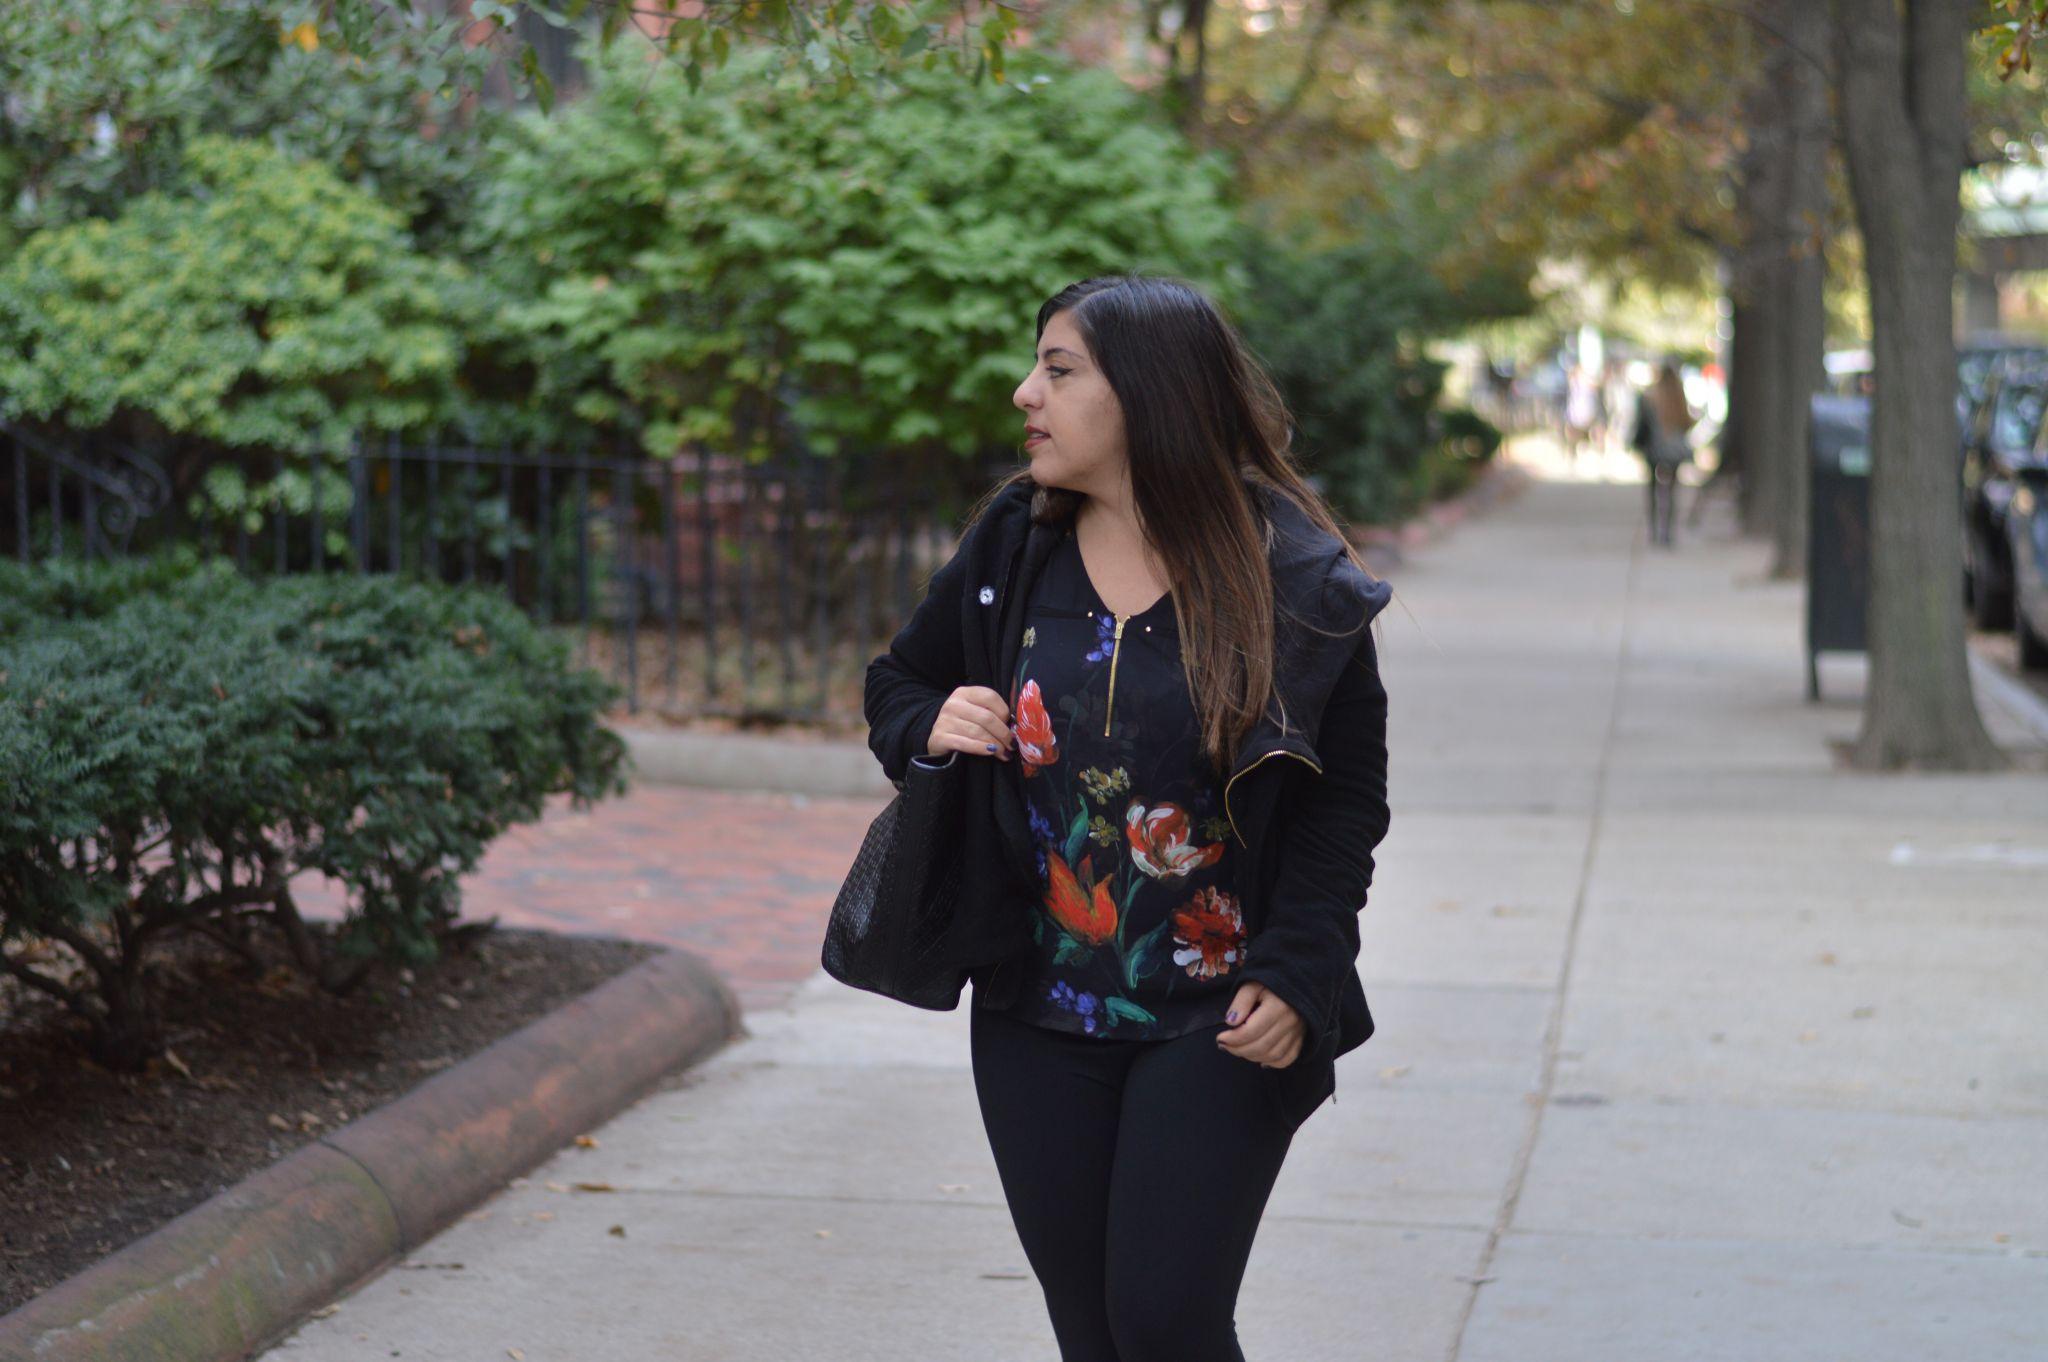 PhD Fashionista Spring Fashion